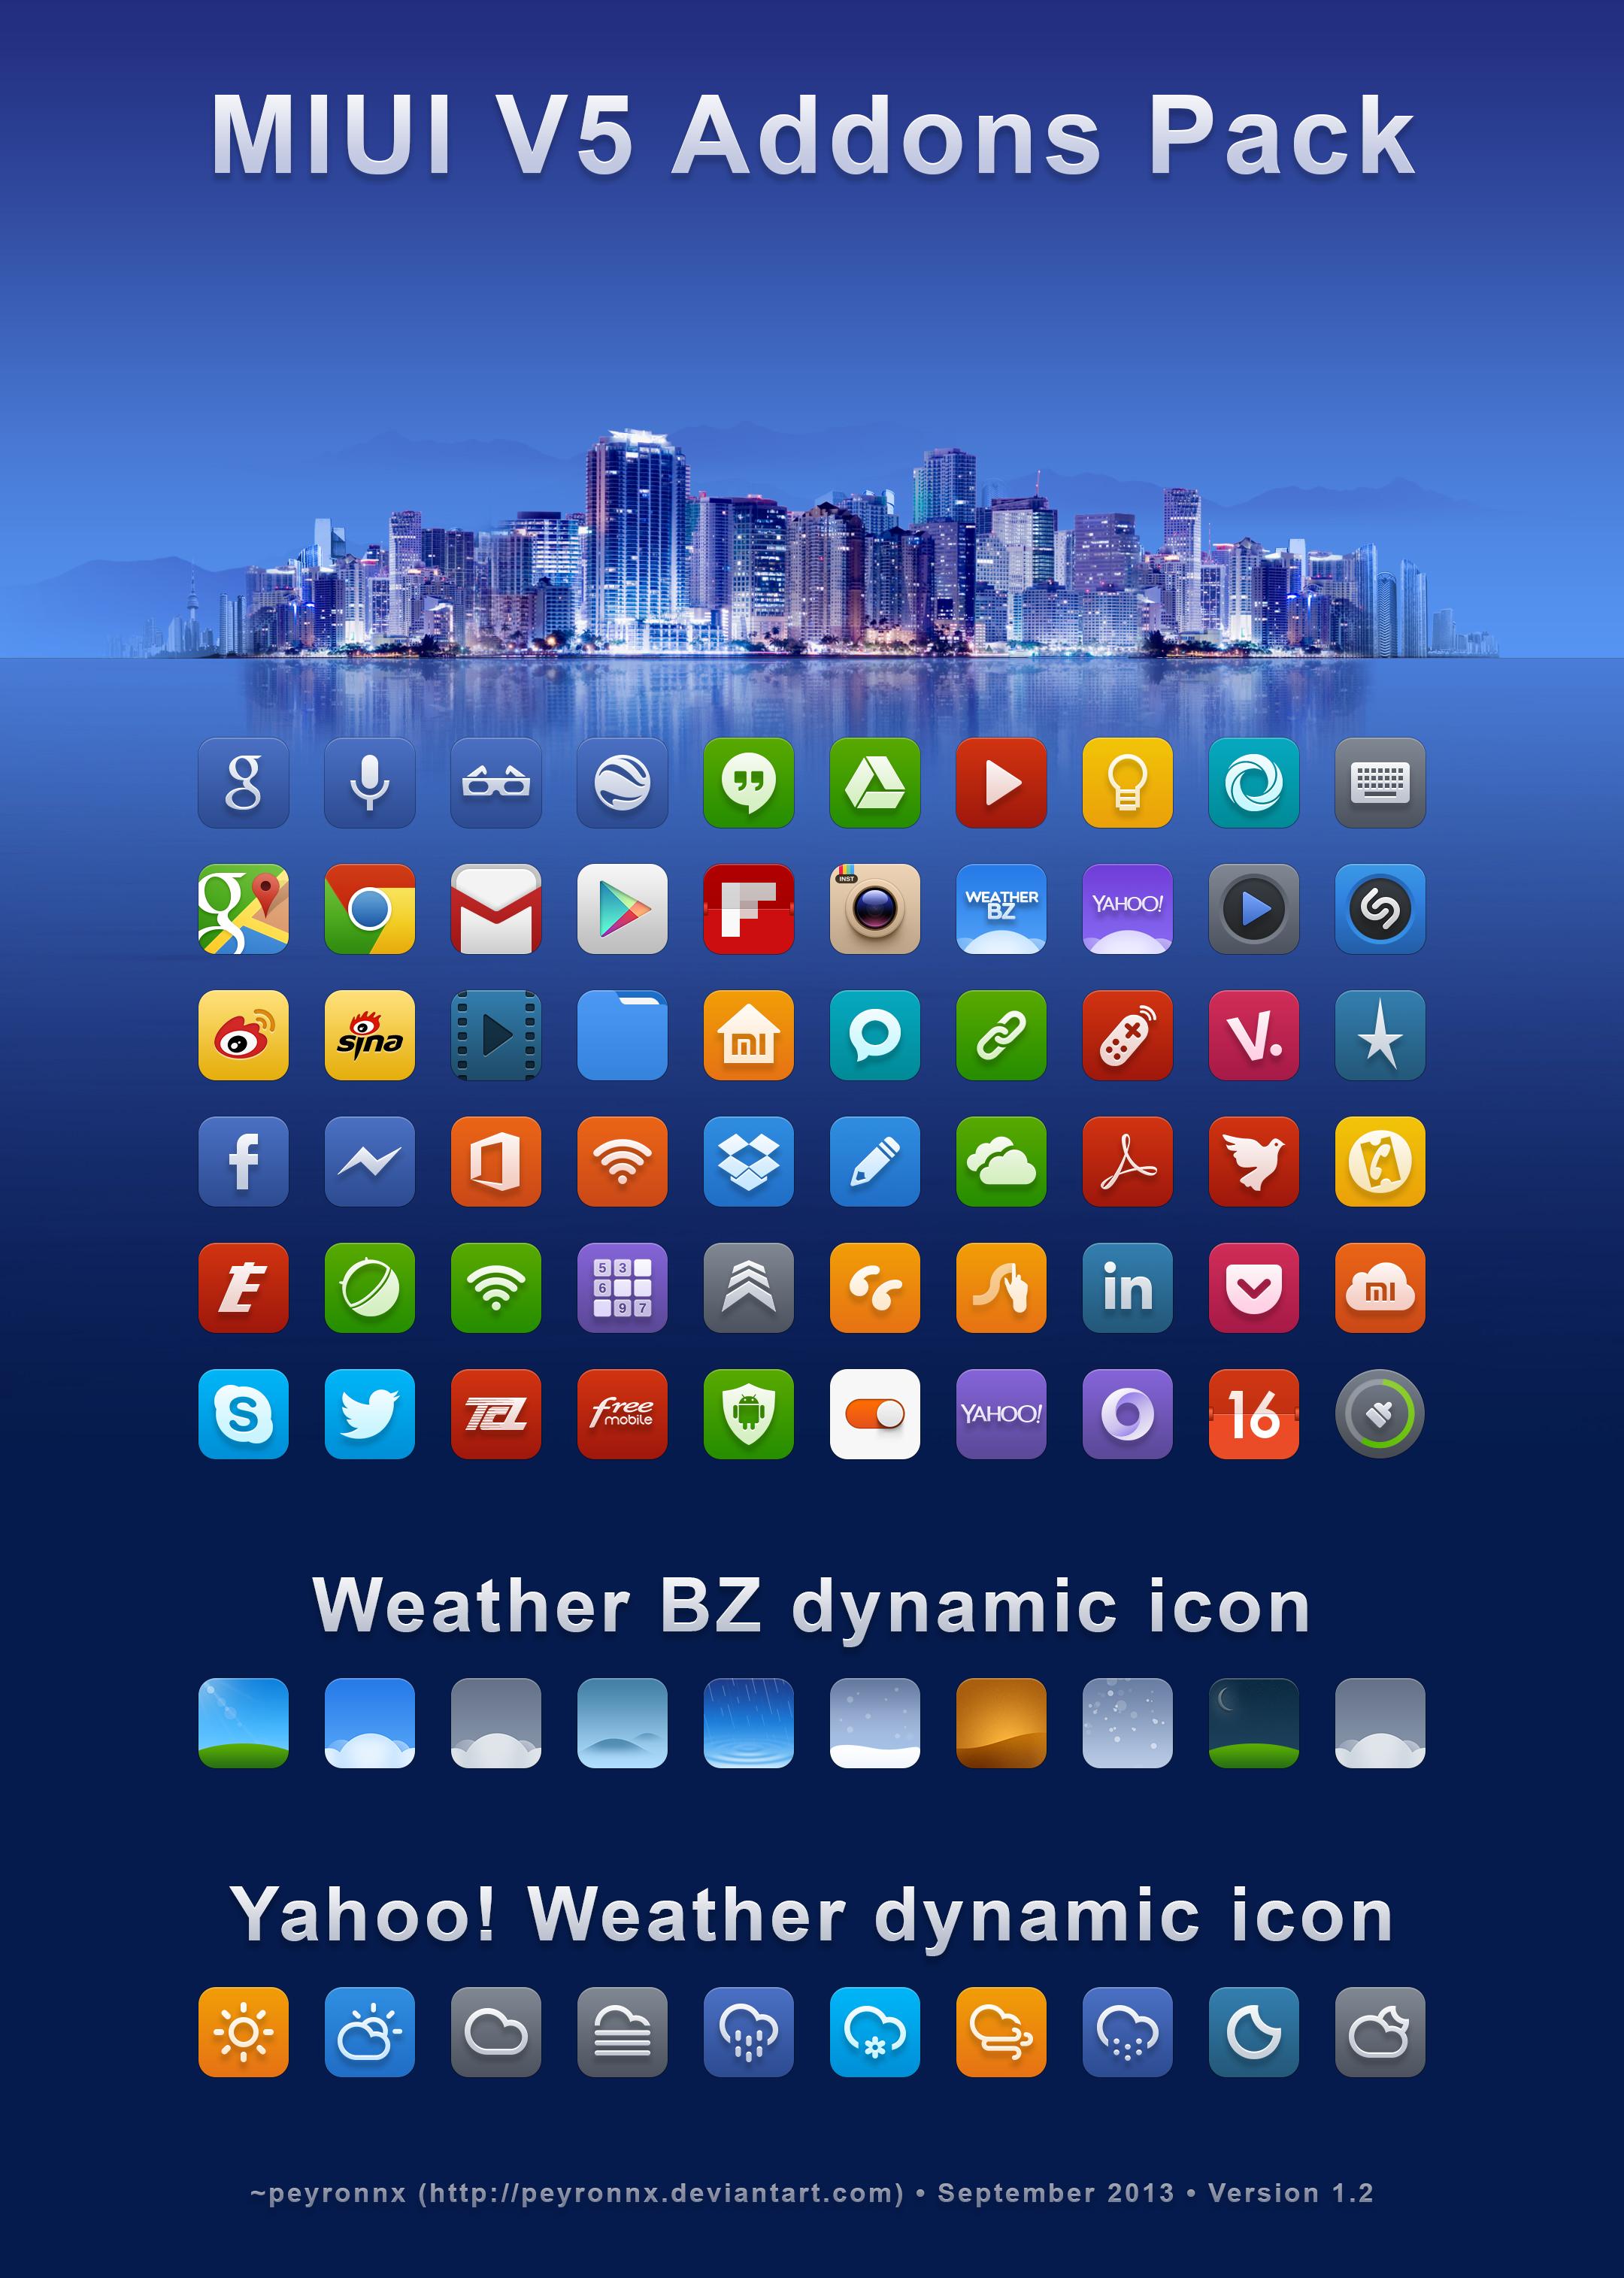 Xiaomi Miui Launcher Download Miui V Addons Pack By Peyronnx Dnymp